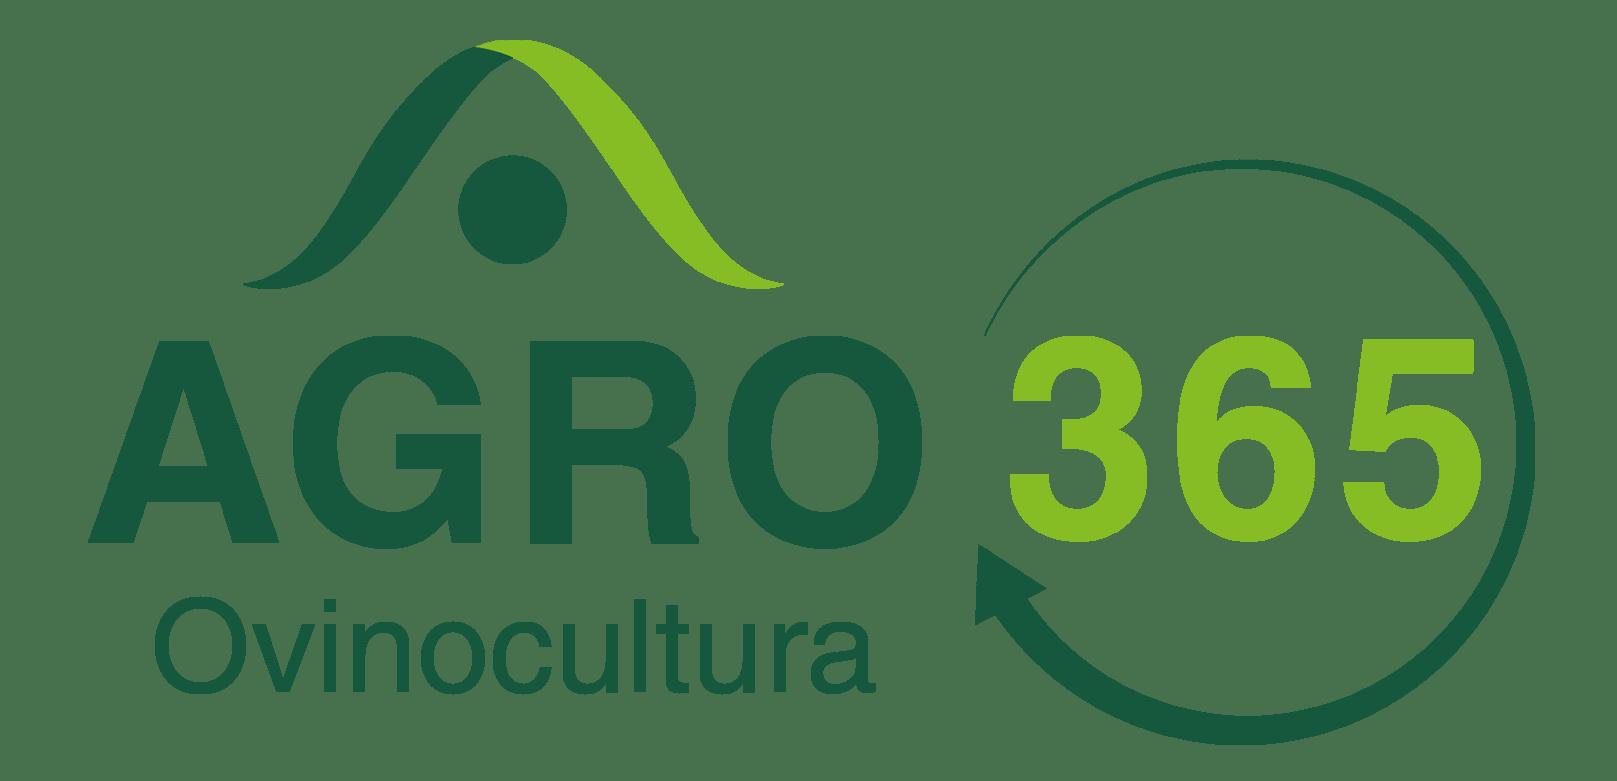 ovinocultura-vertical.png